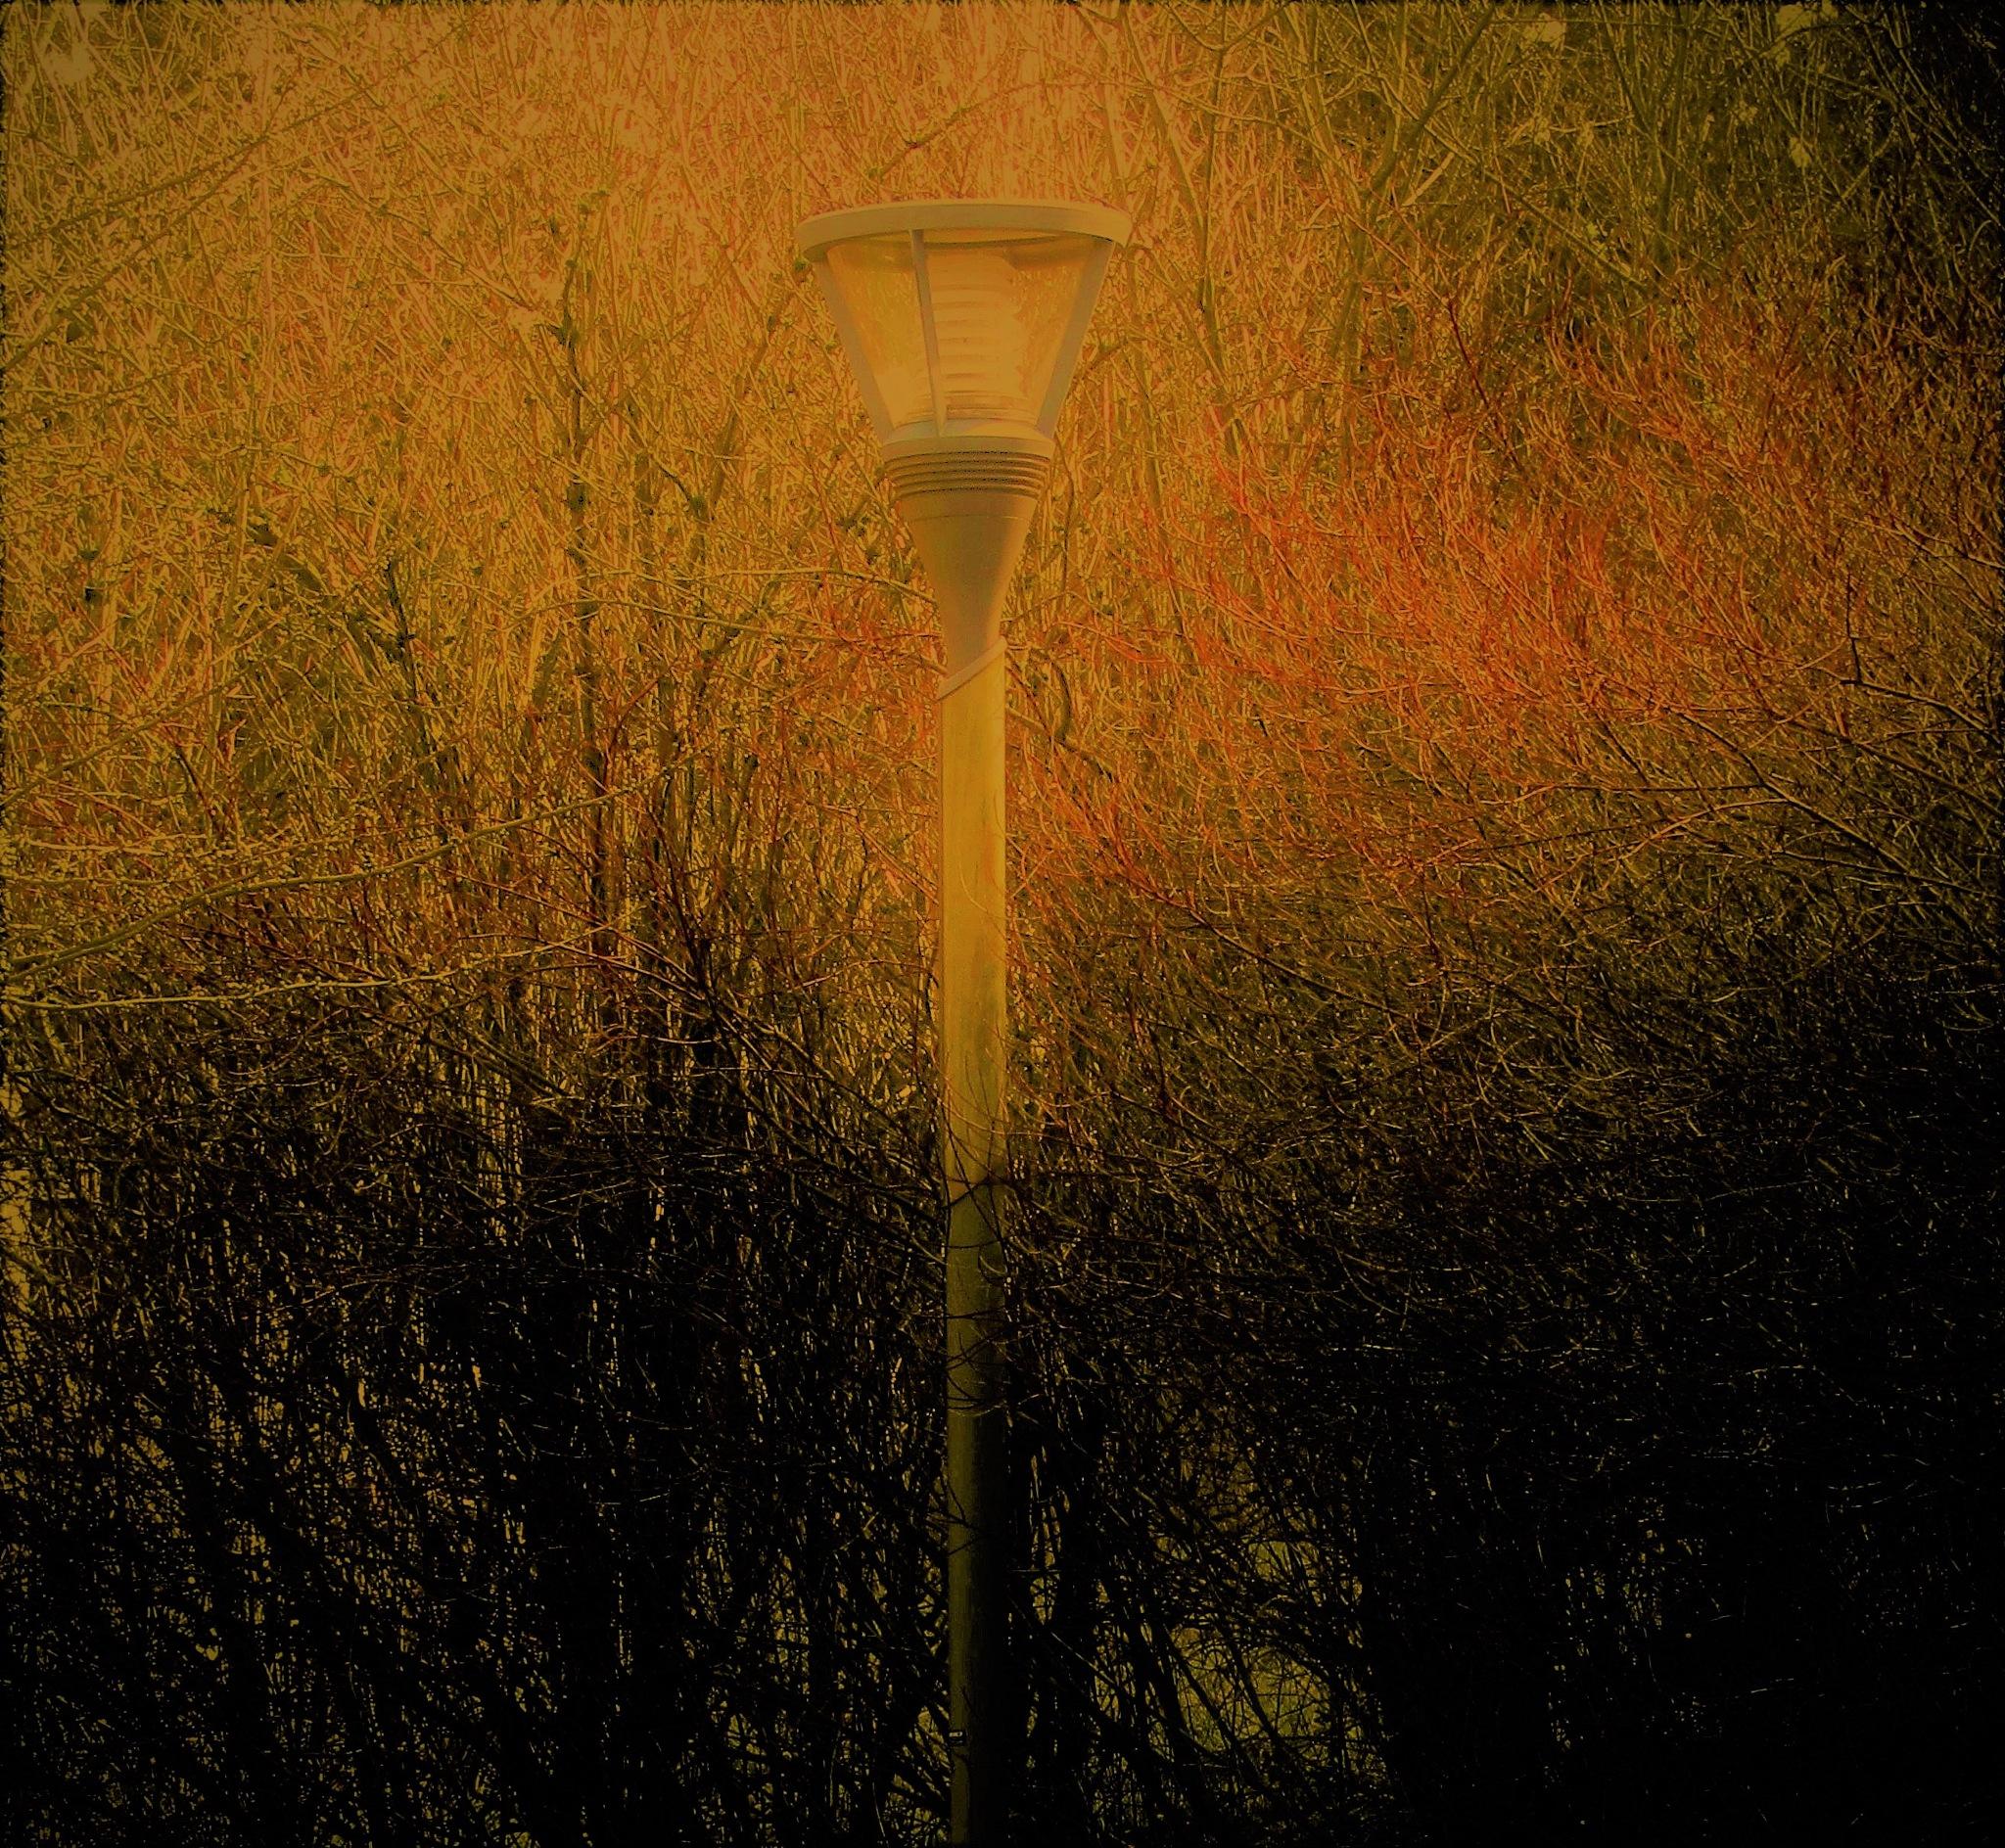 luminaire by vigilicatherine